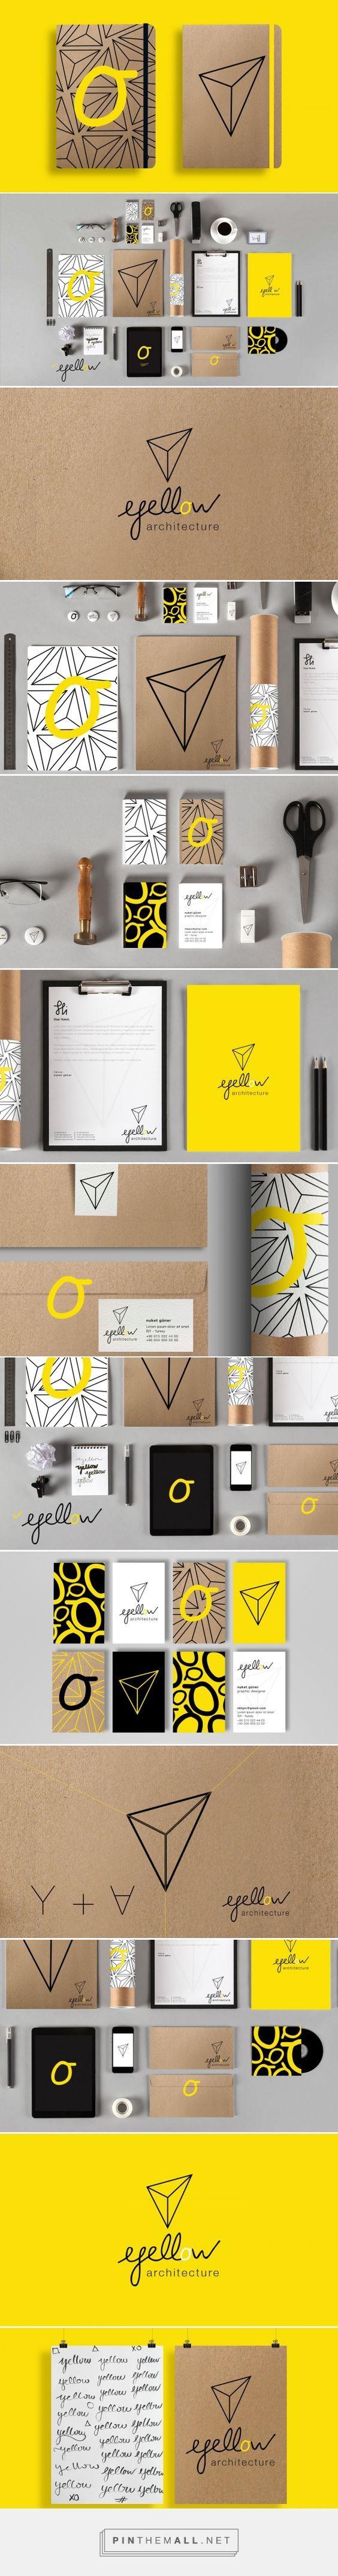 Yellow Architecture Branding by Nuket Guner Corlan   Fivestar Branding – Design and Branding Agency & Inspiration Gallery: